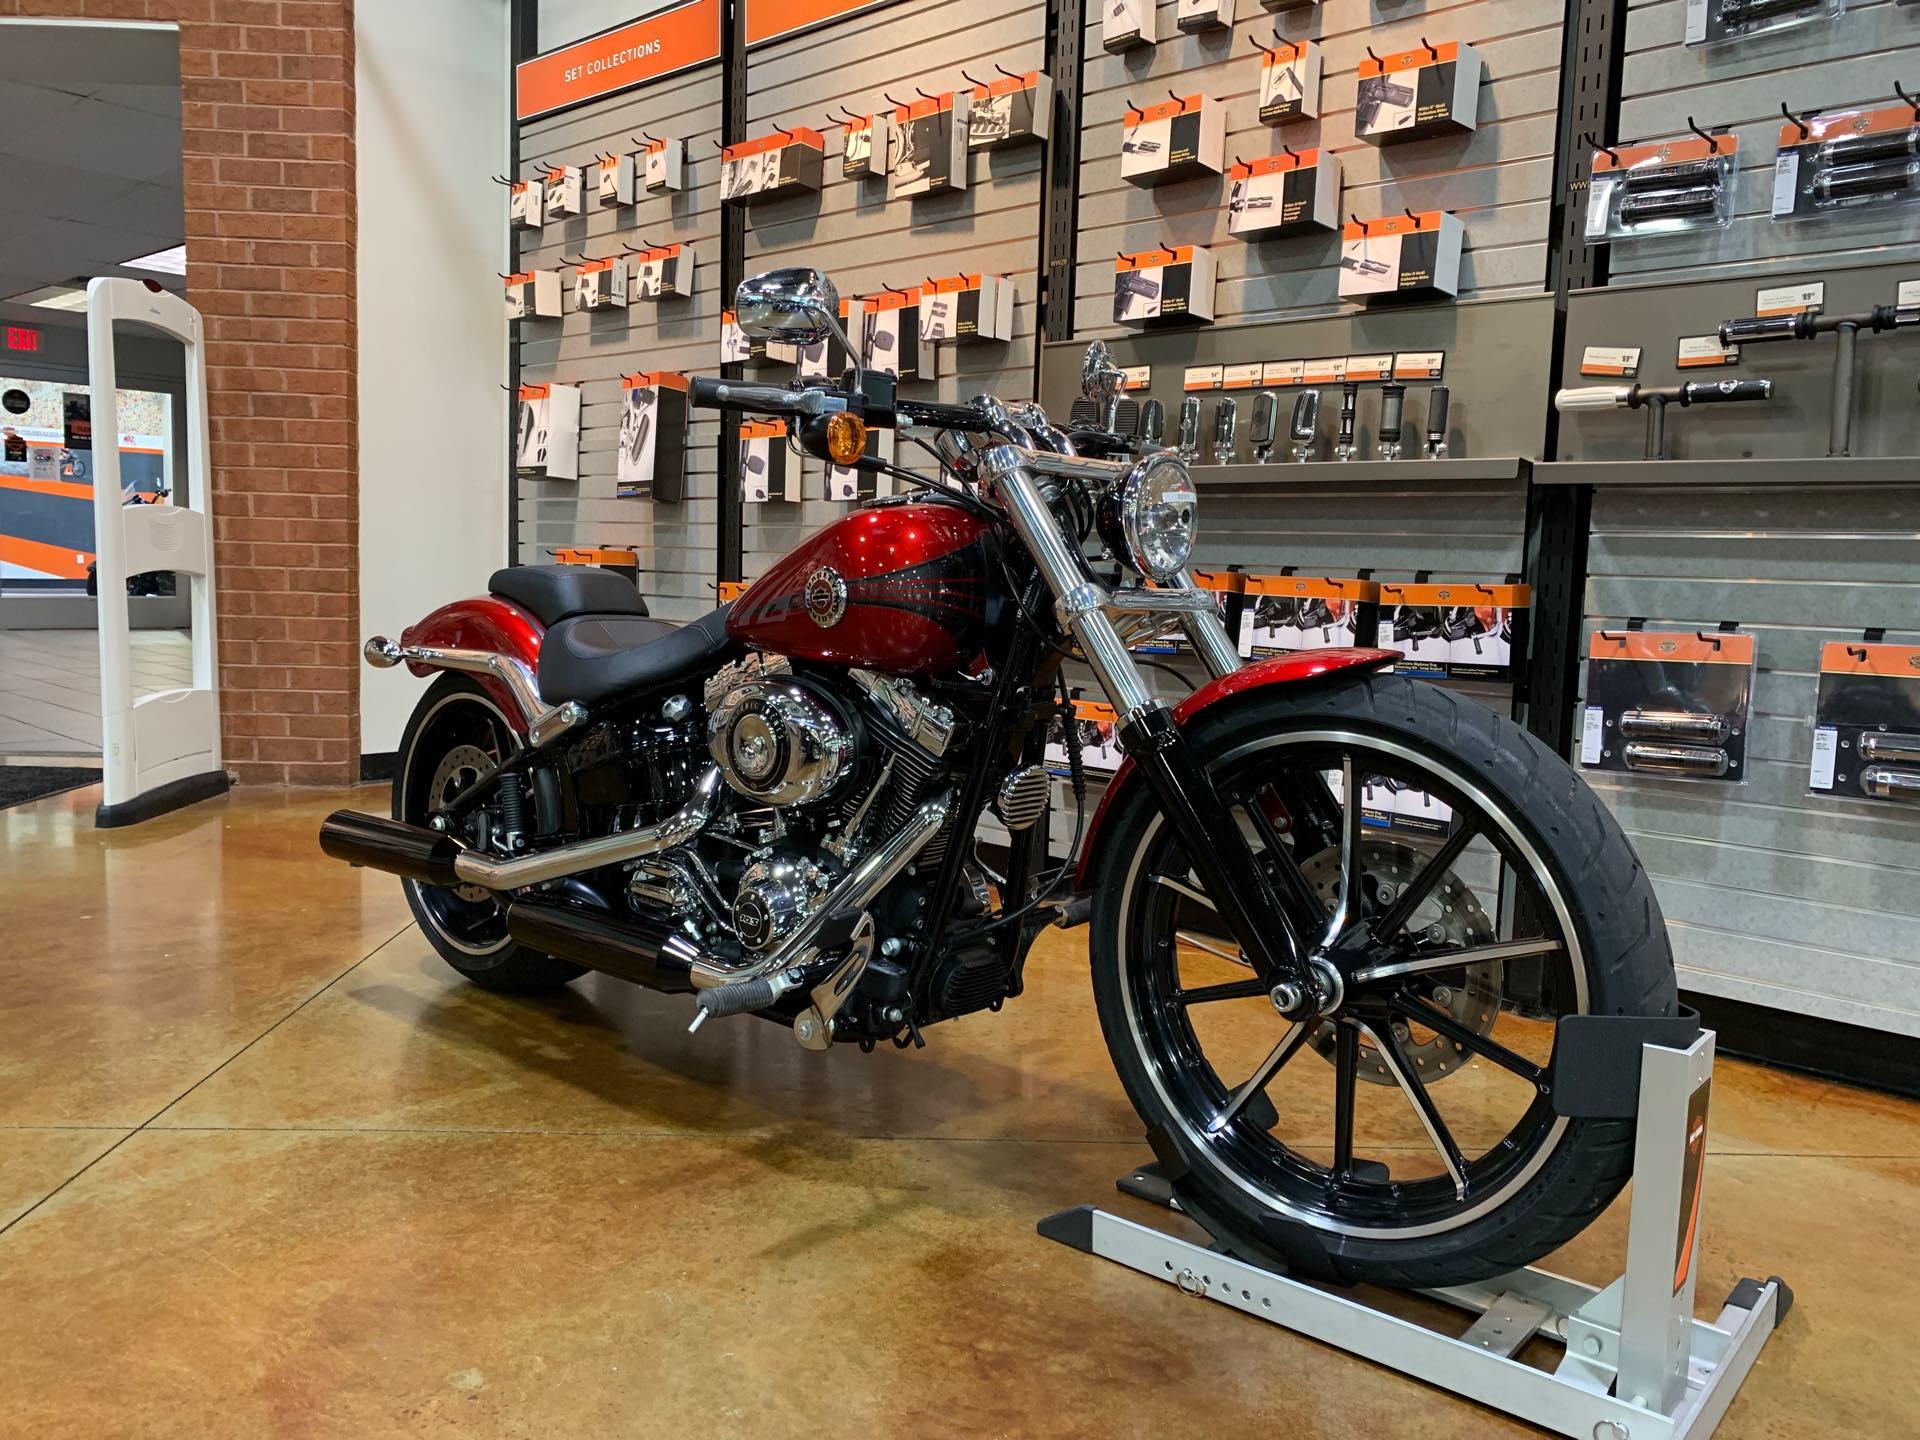 2013 Harley-Davidson Softail Breakout at Colonial Harley-Davidson